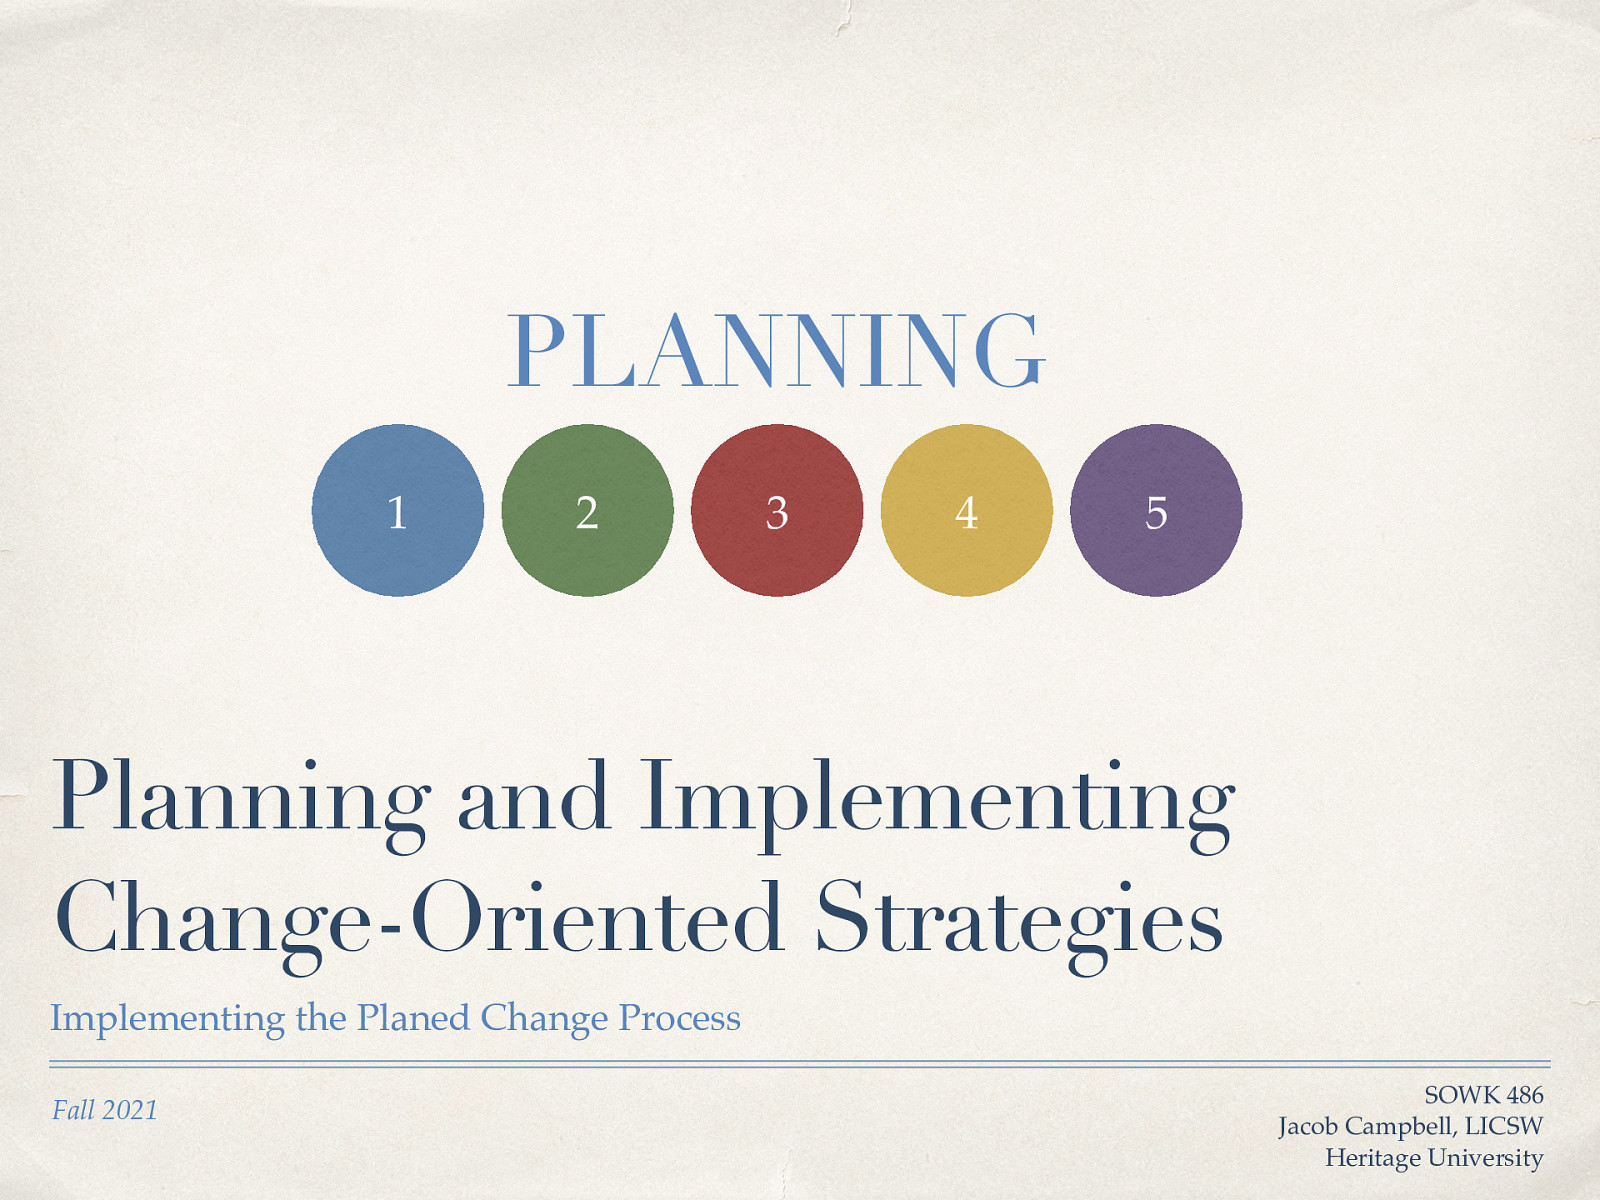 SOWK 486 - Week 10 - Planning in Generalist Practice by Jacob Campbell